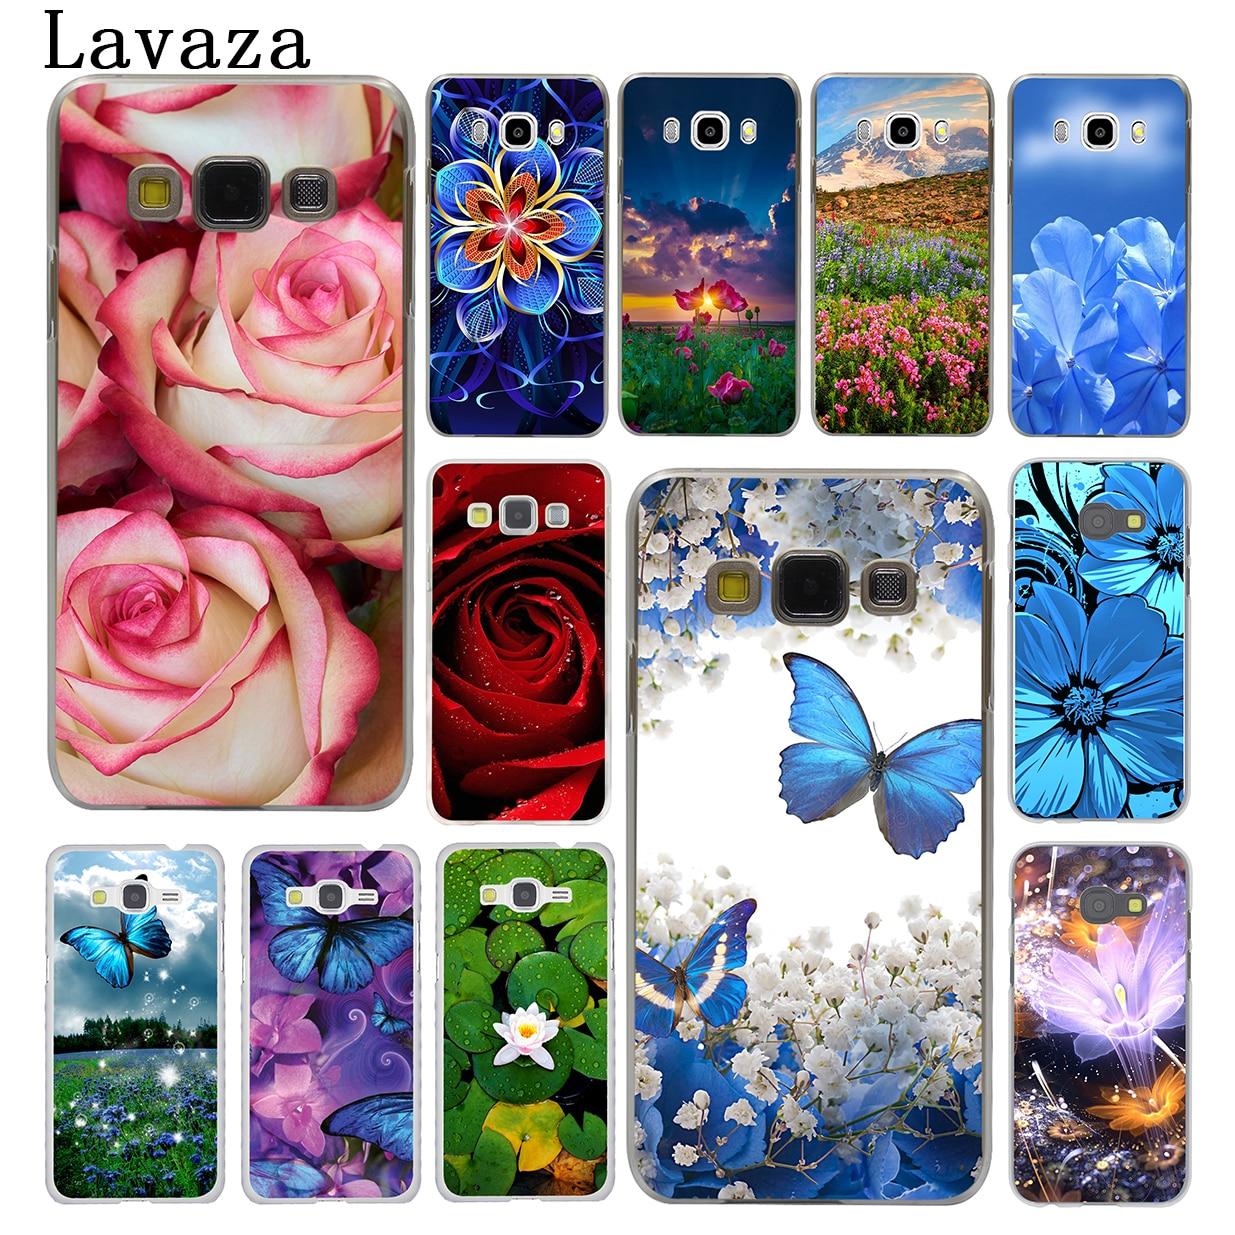 Lavaza Rose flower Peony Butterfly Hard Phone Case for Samsung Galaxy J7 J1 J2 J3 J5 2015 2016 2017 Prime Pro Ace 2018 Cover